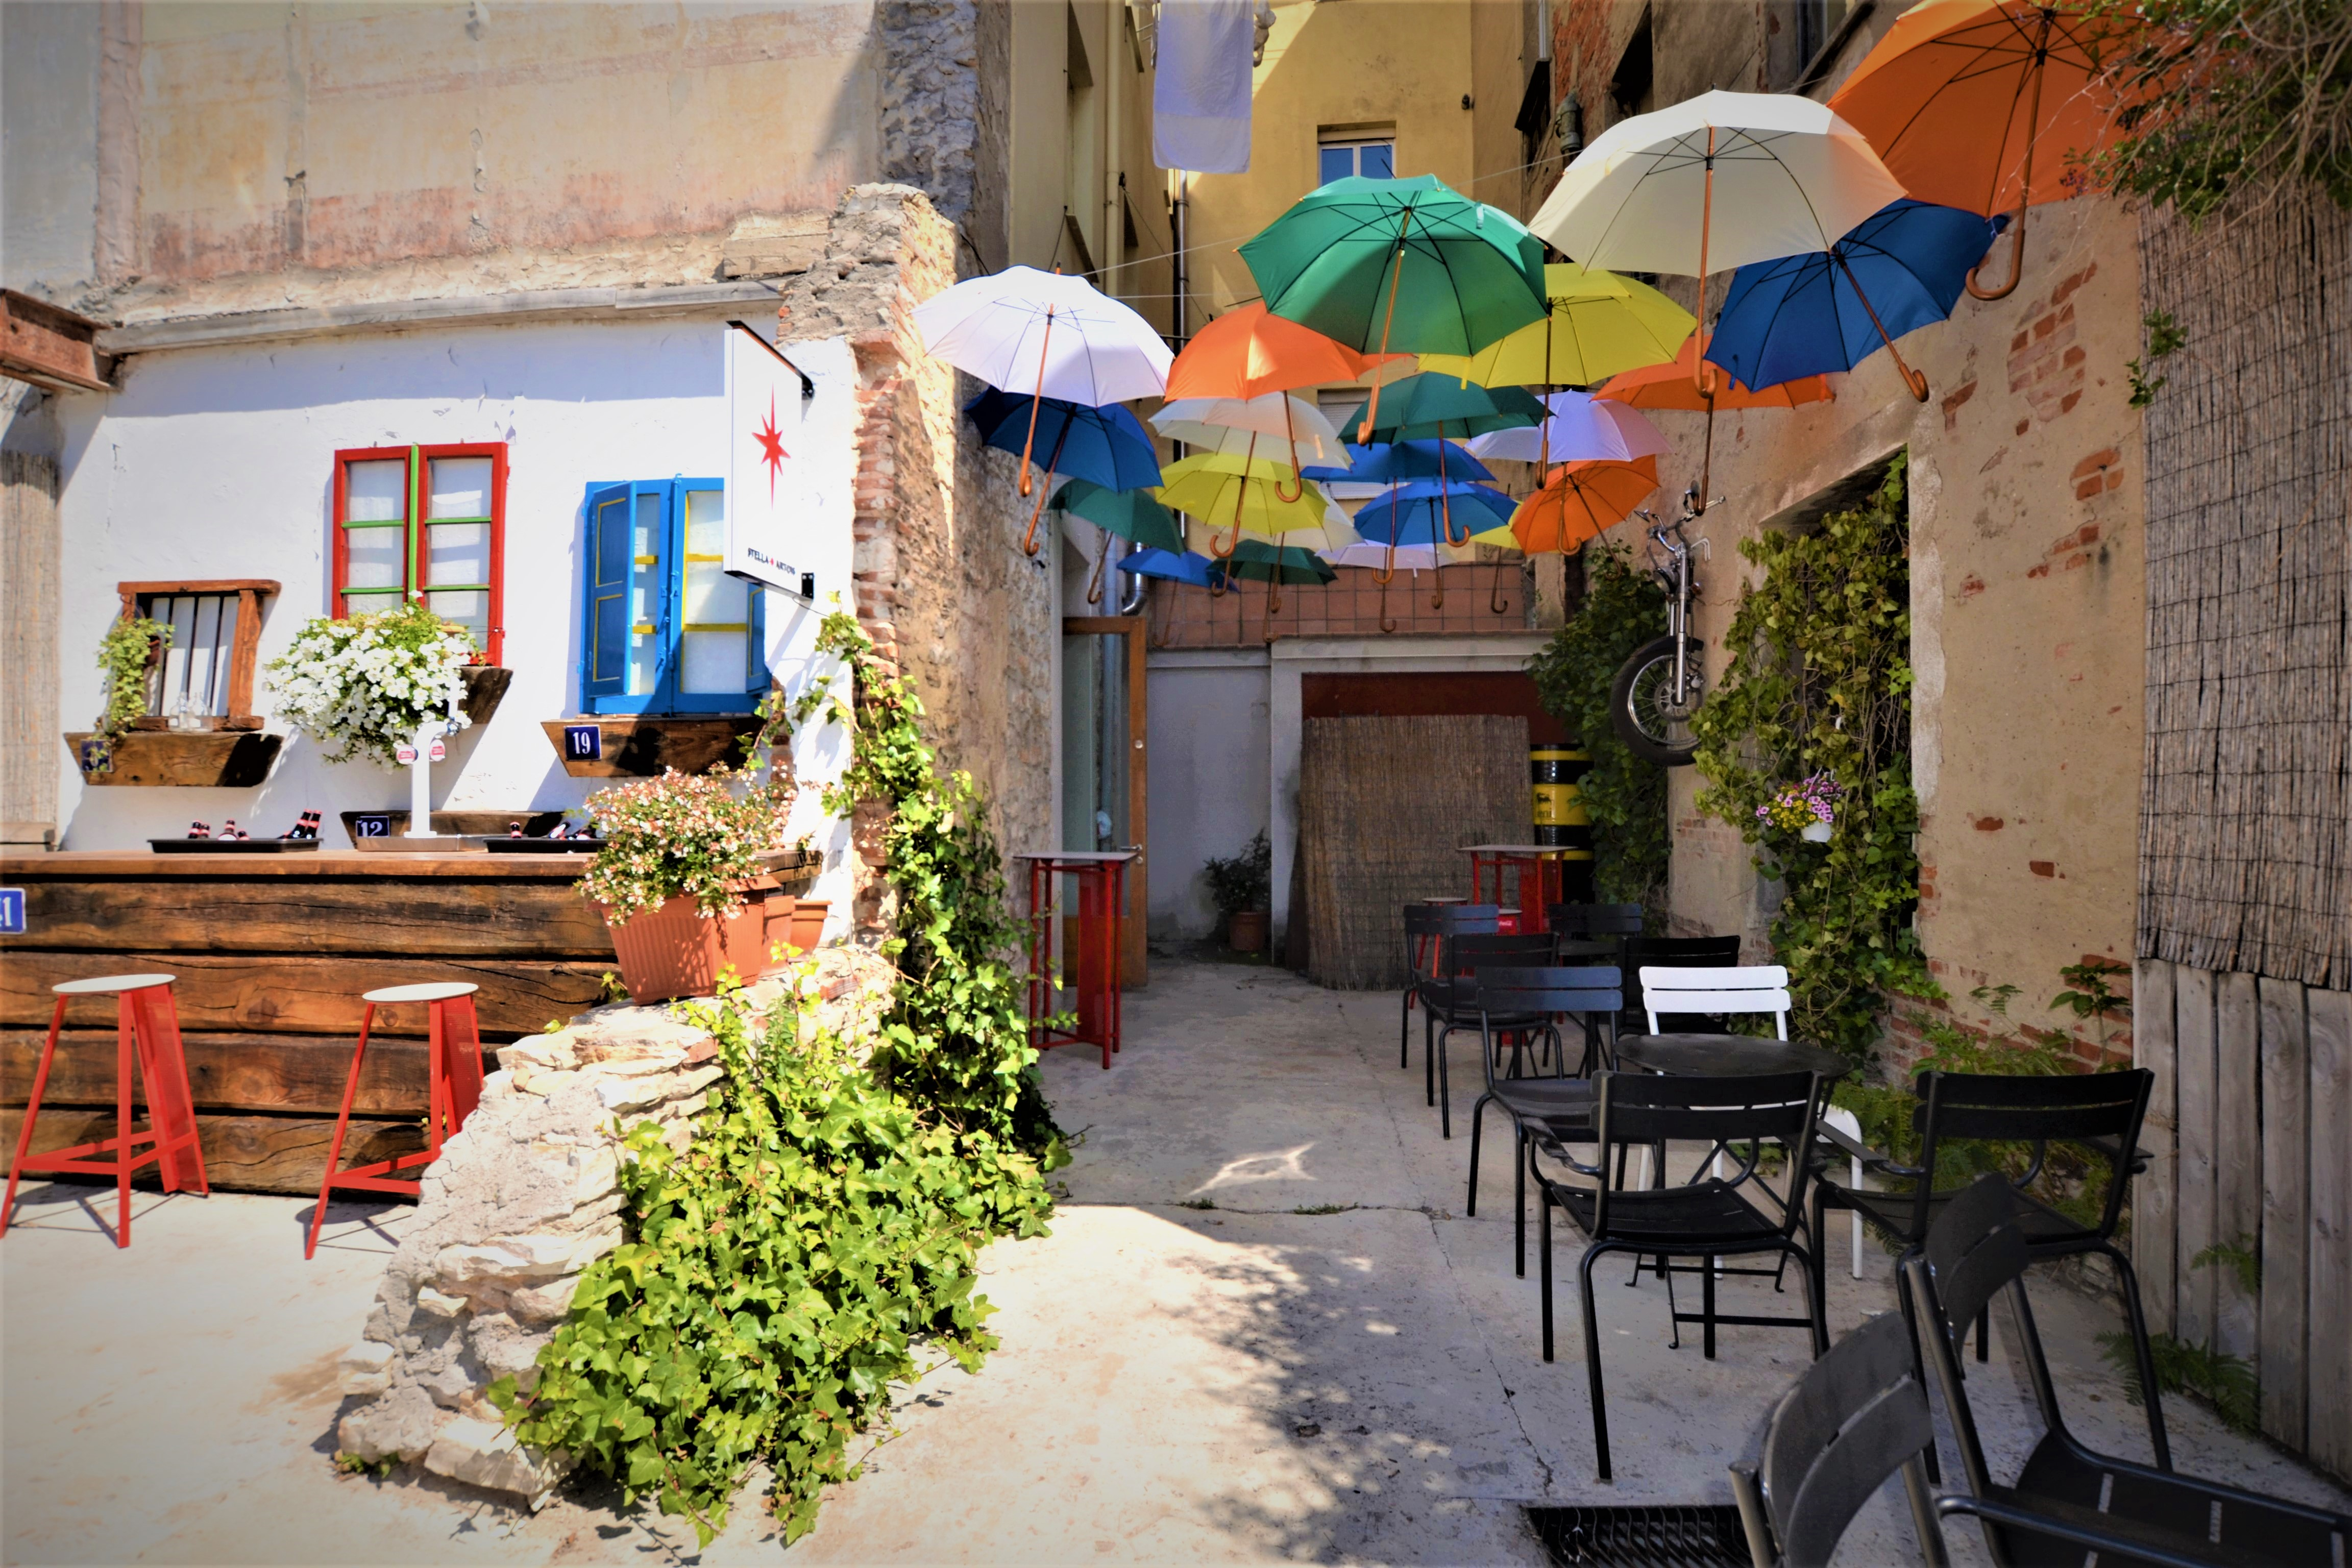 Terraza Carmen 13. Bares y restaurantes en fase 1